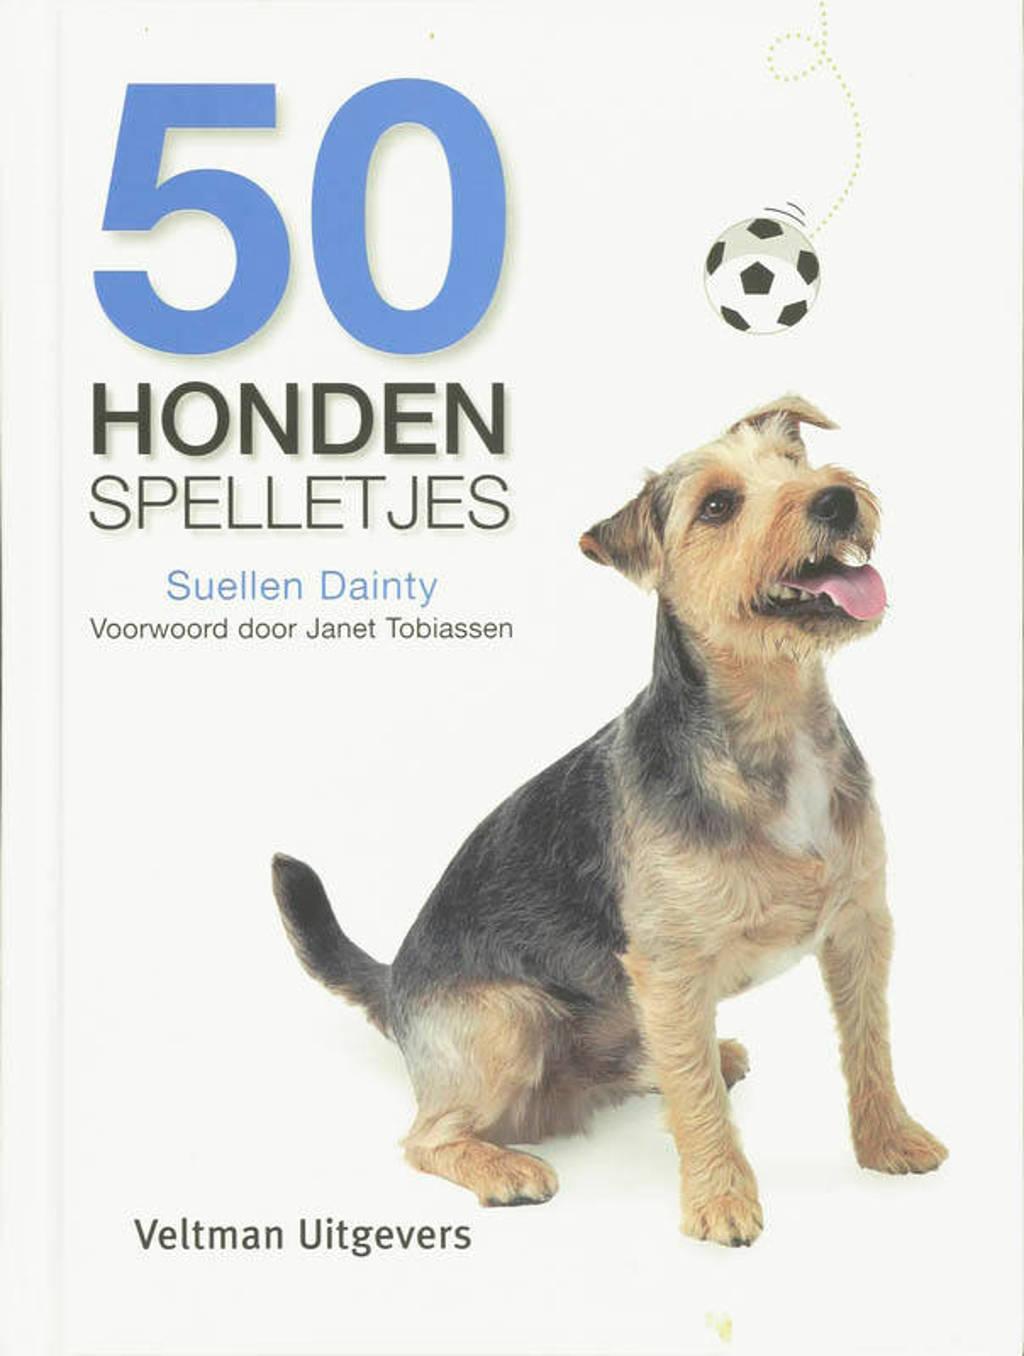 50 hondenspelletjes - S. Dainty